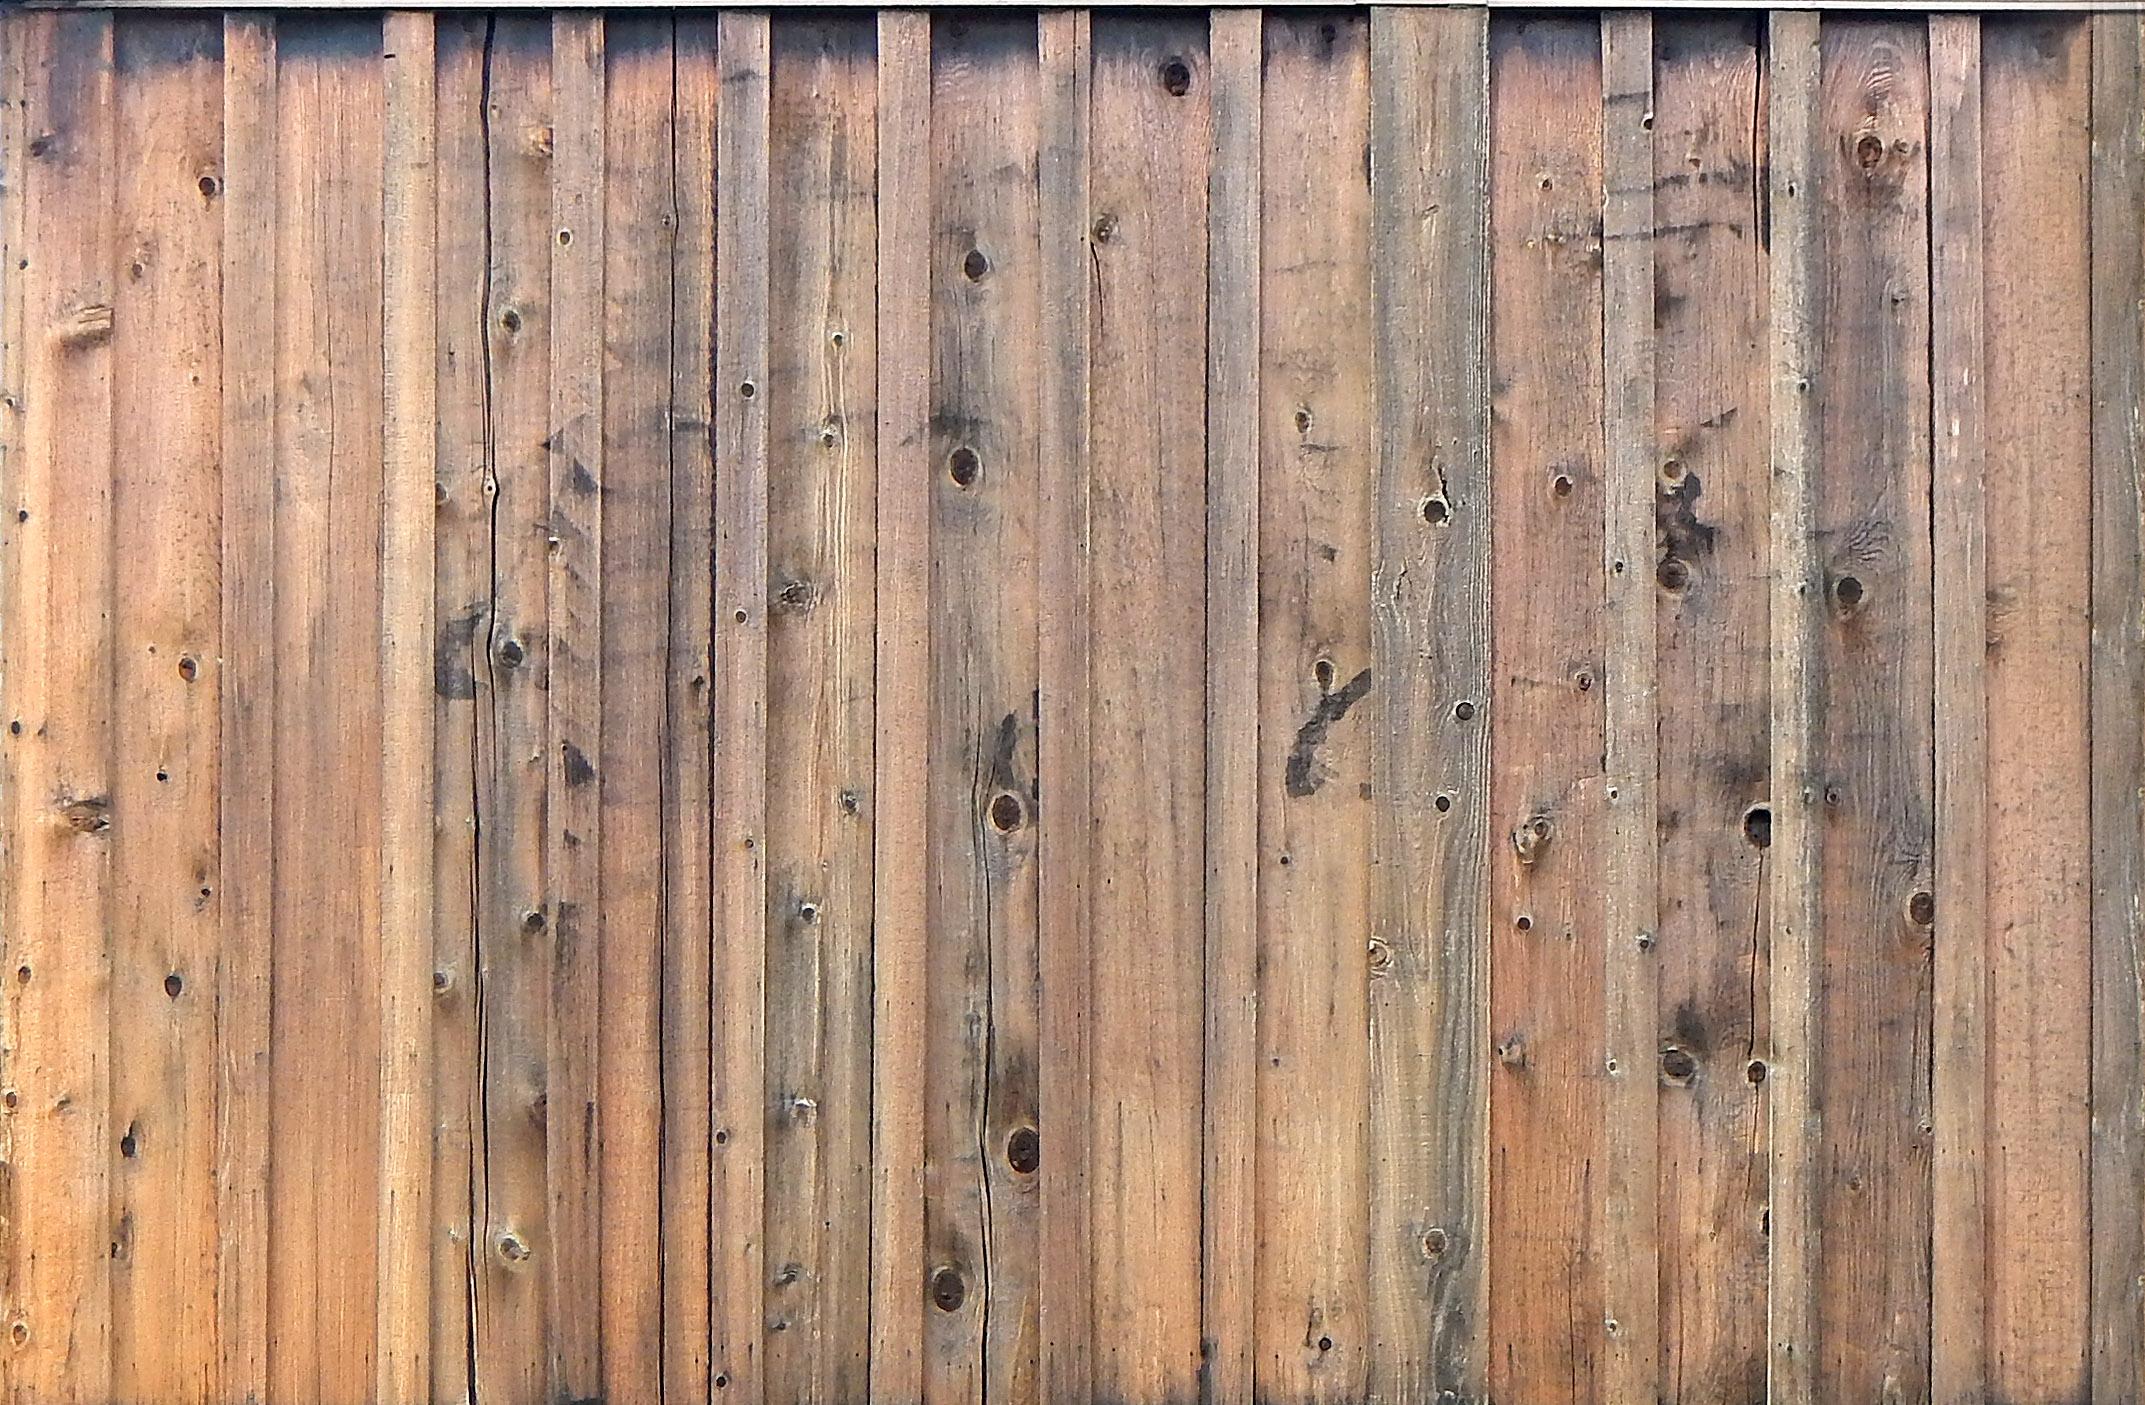 free photo wooden planks wood tree texture free download jooinn